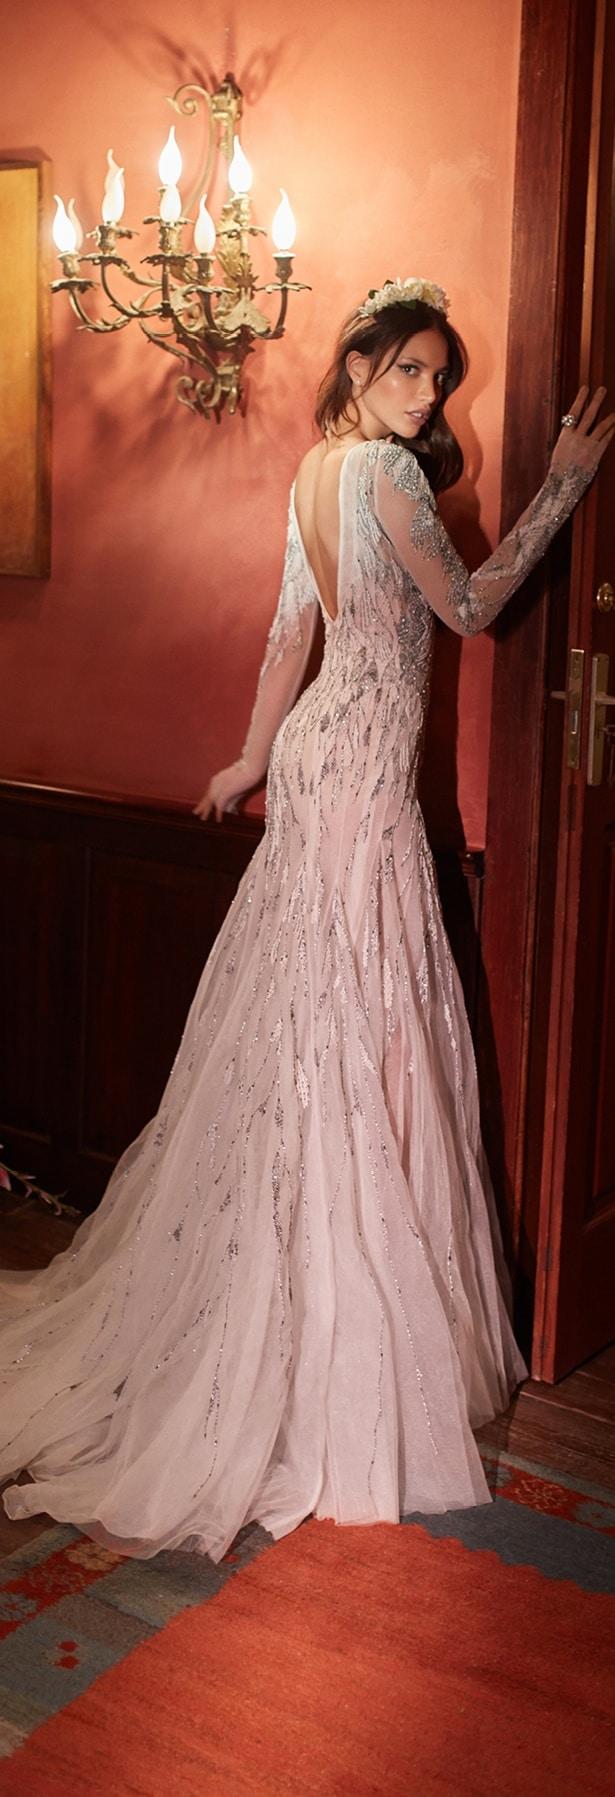 Galia Lahav Couture Bridal Fall 2018 Collection | Hey Wedding Lady